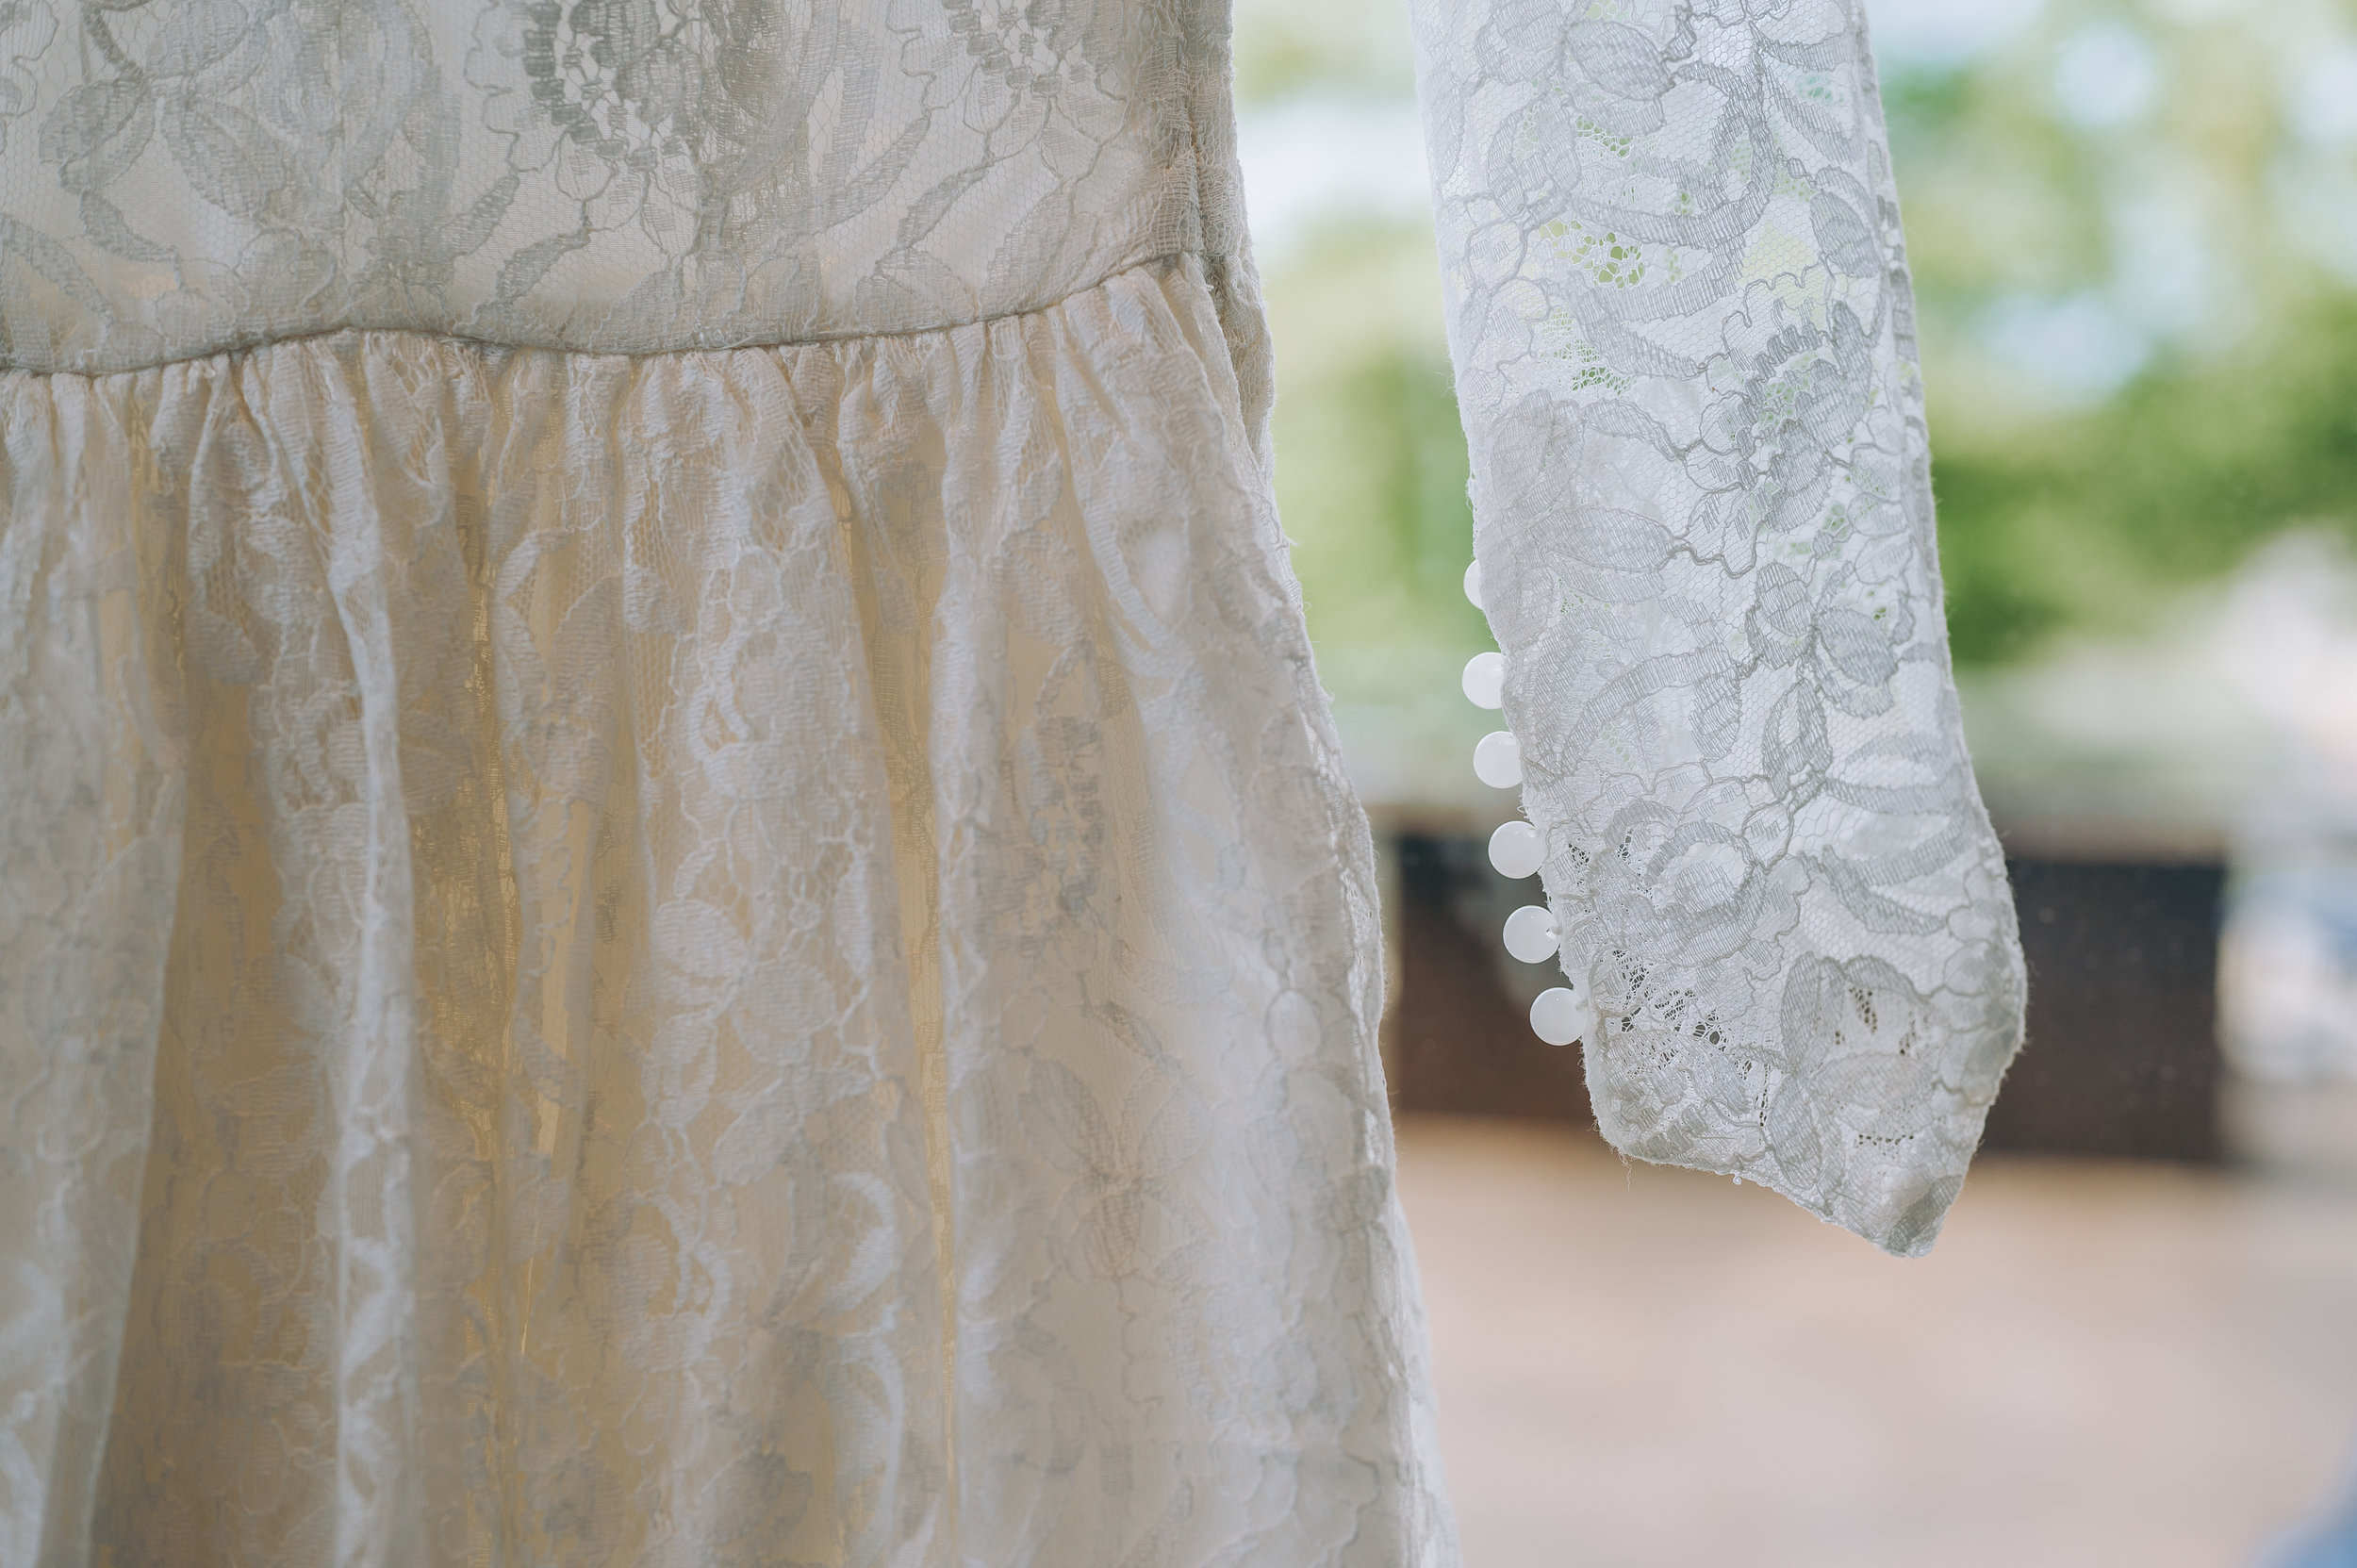 Jenny + Keith Nashville Wedding - Details Nashville